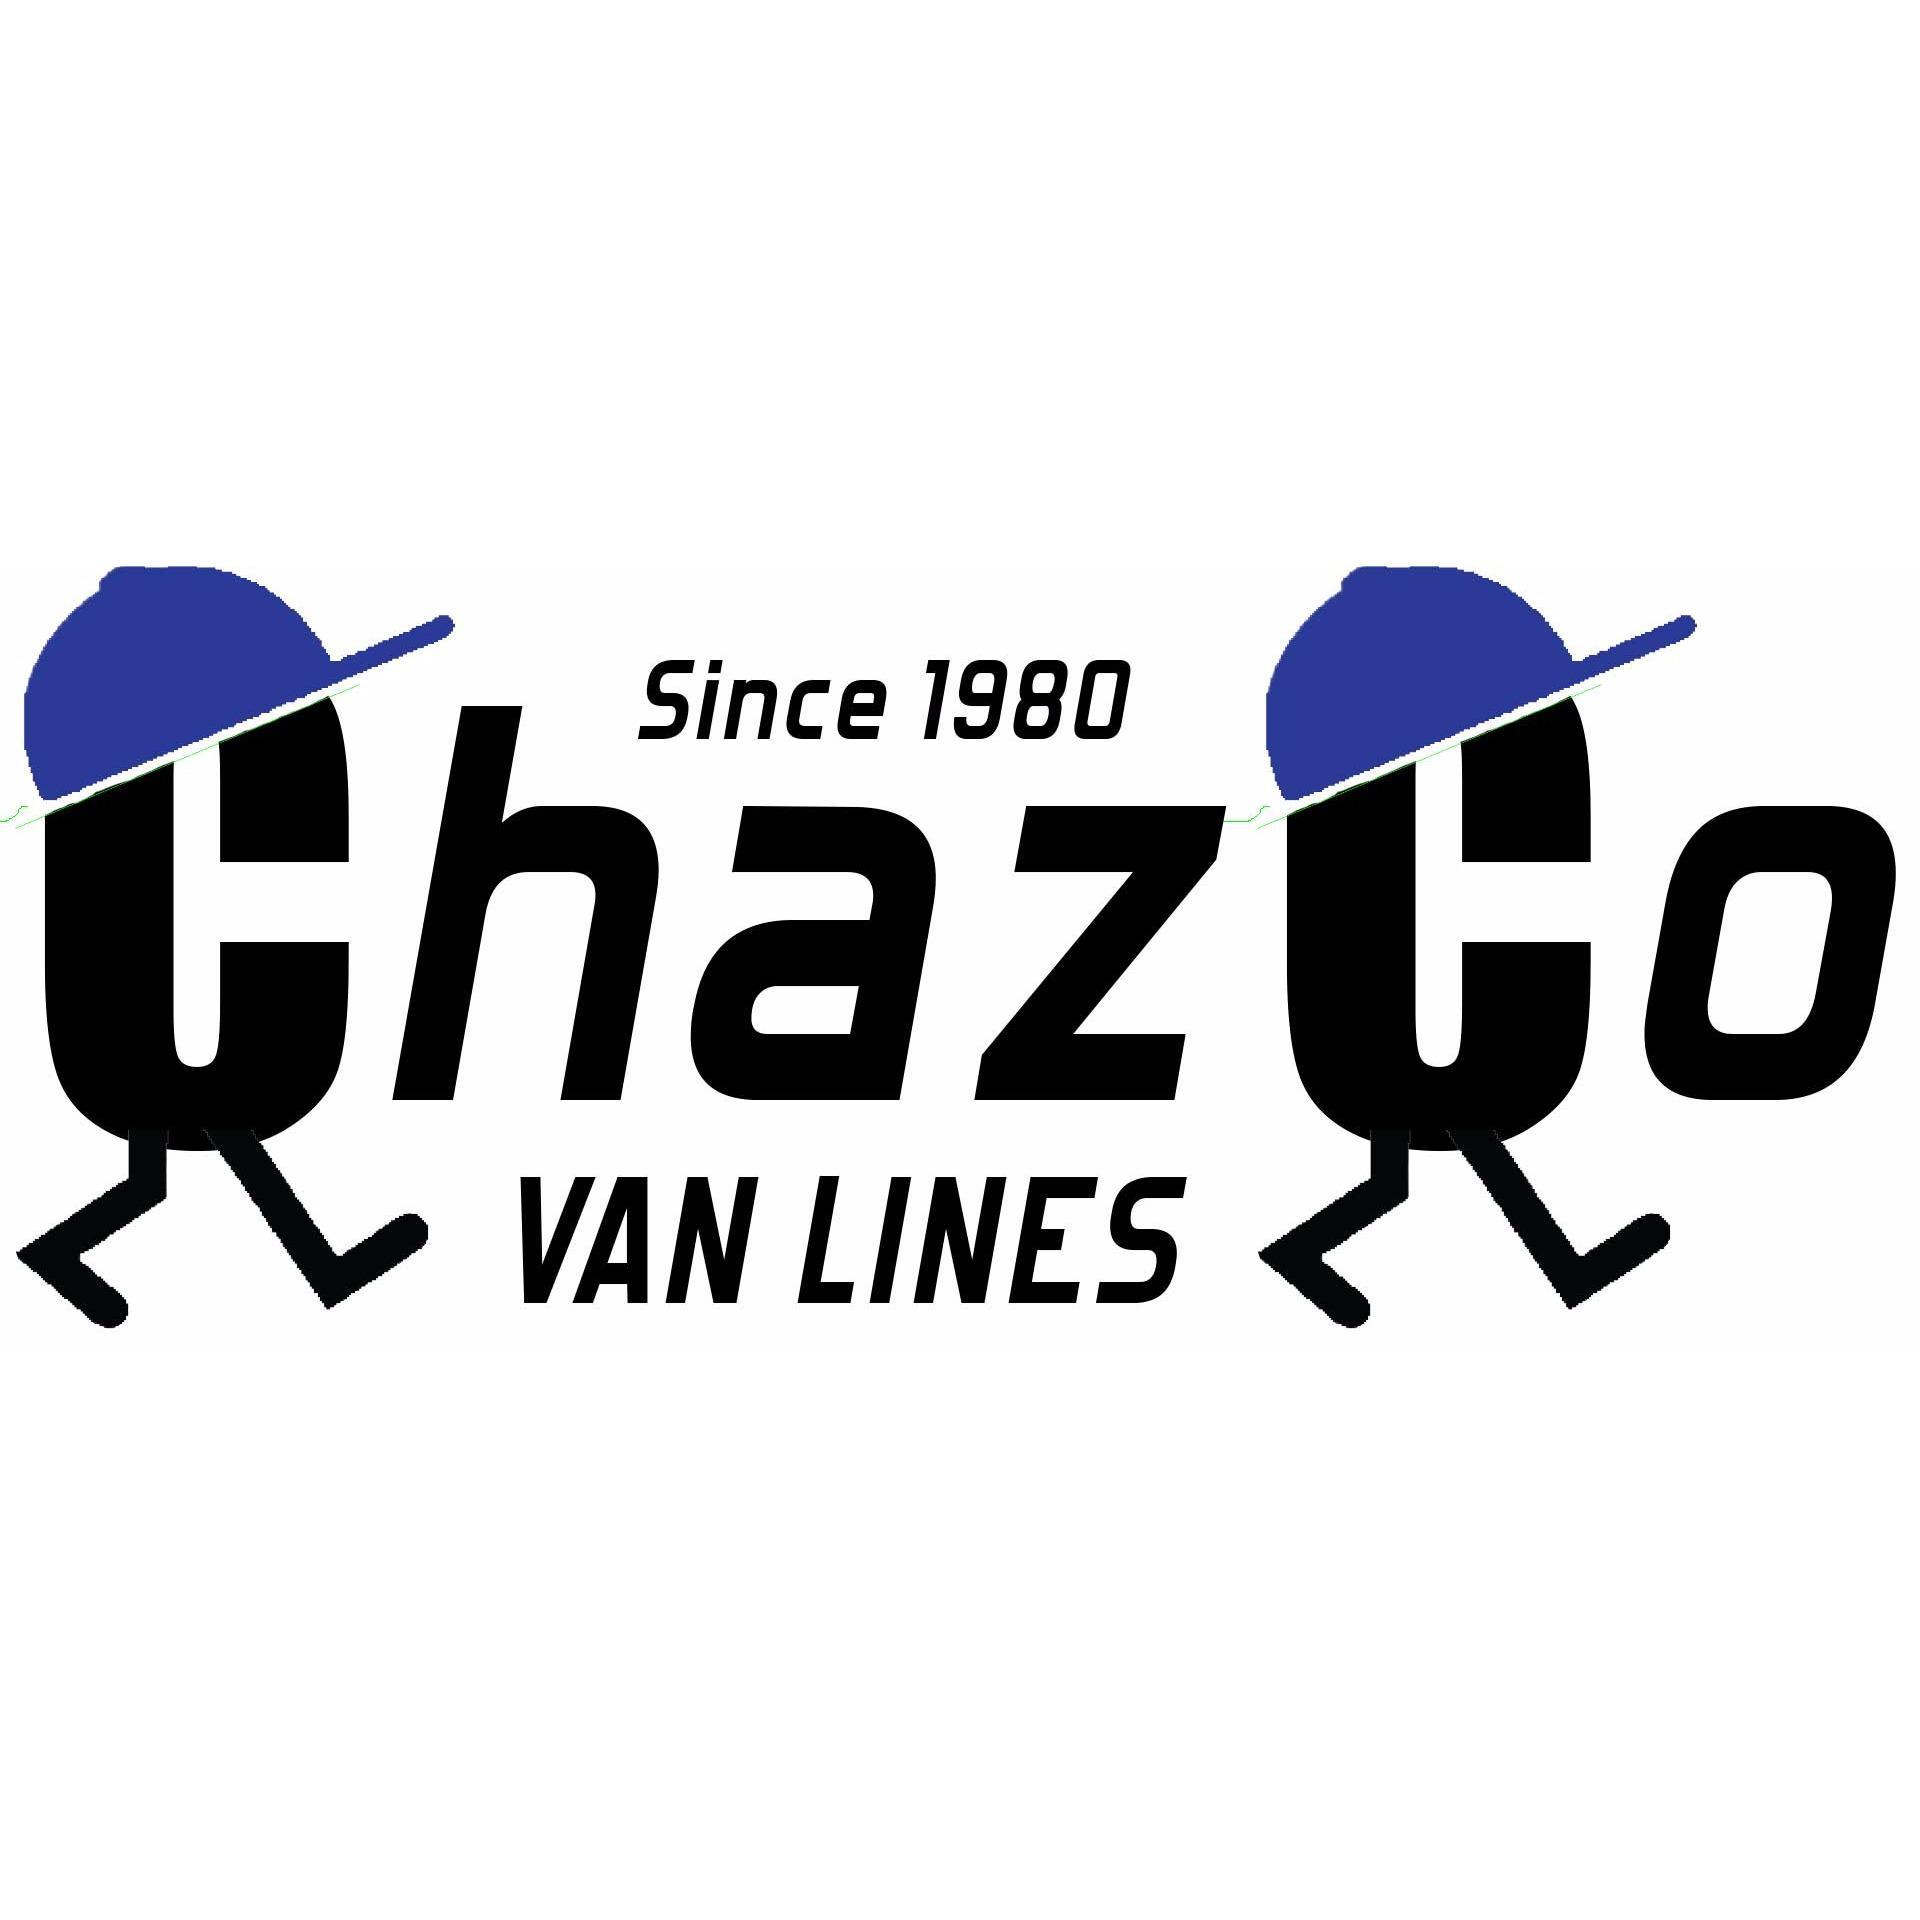 Chazco Van Lines